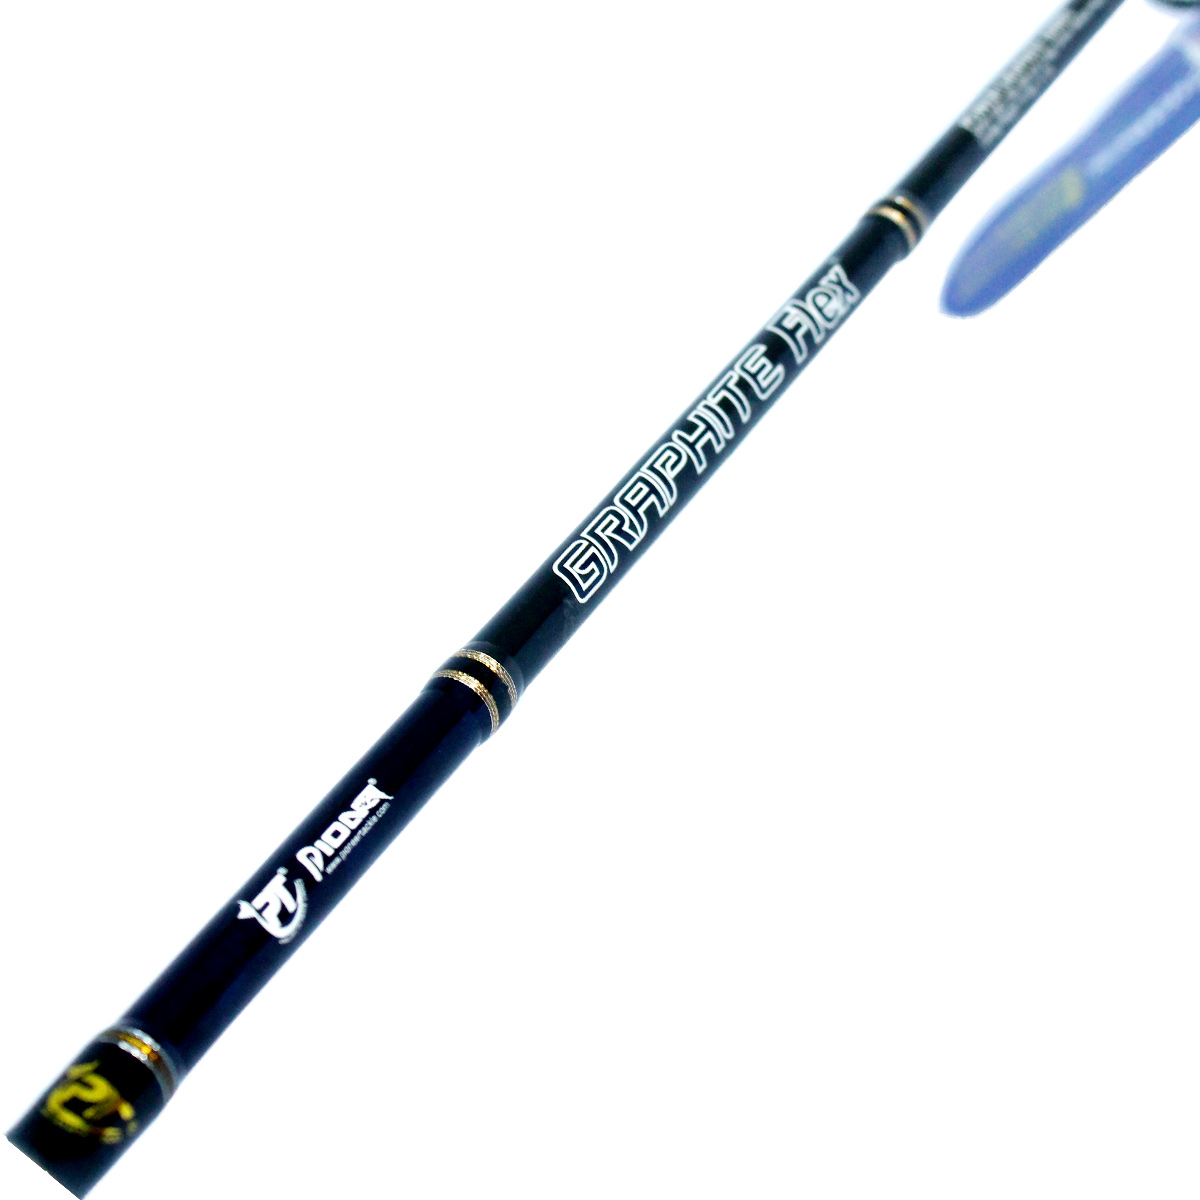 Cần Câu Hai Khúc Pioneer Graphite Flex - 802 2m4